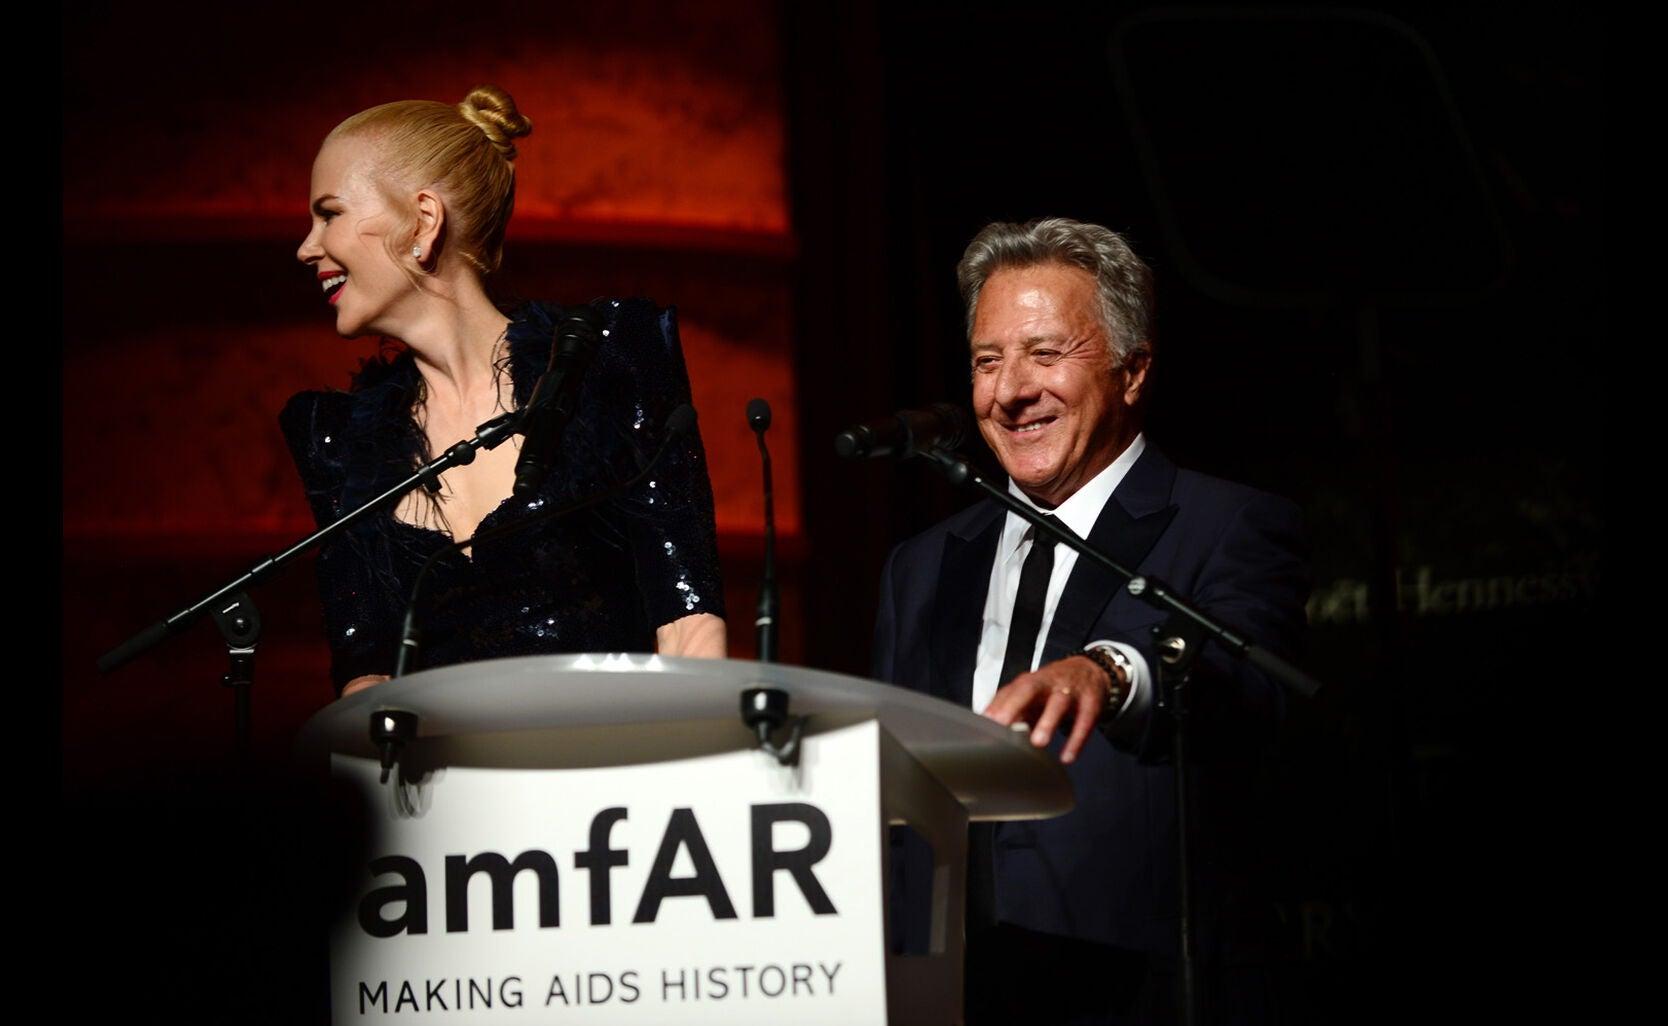 Nicole Kidman and Dustin Hoffman